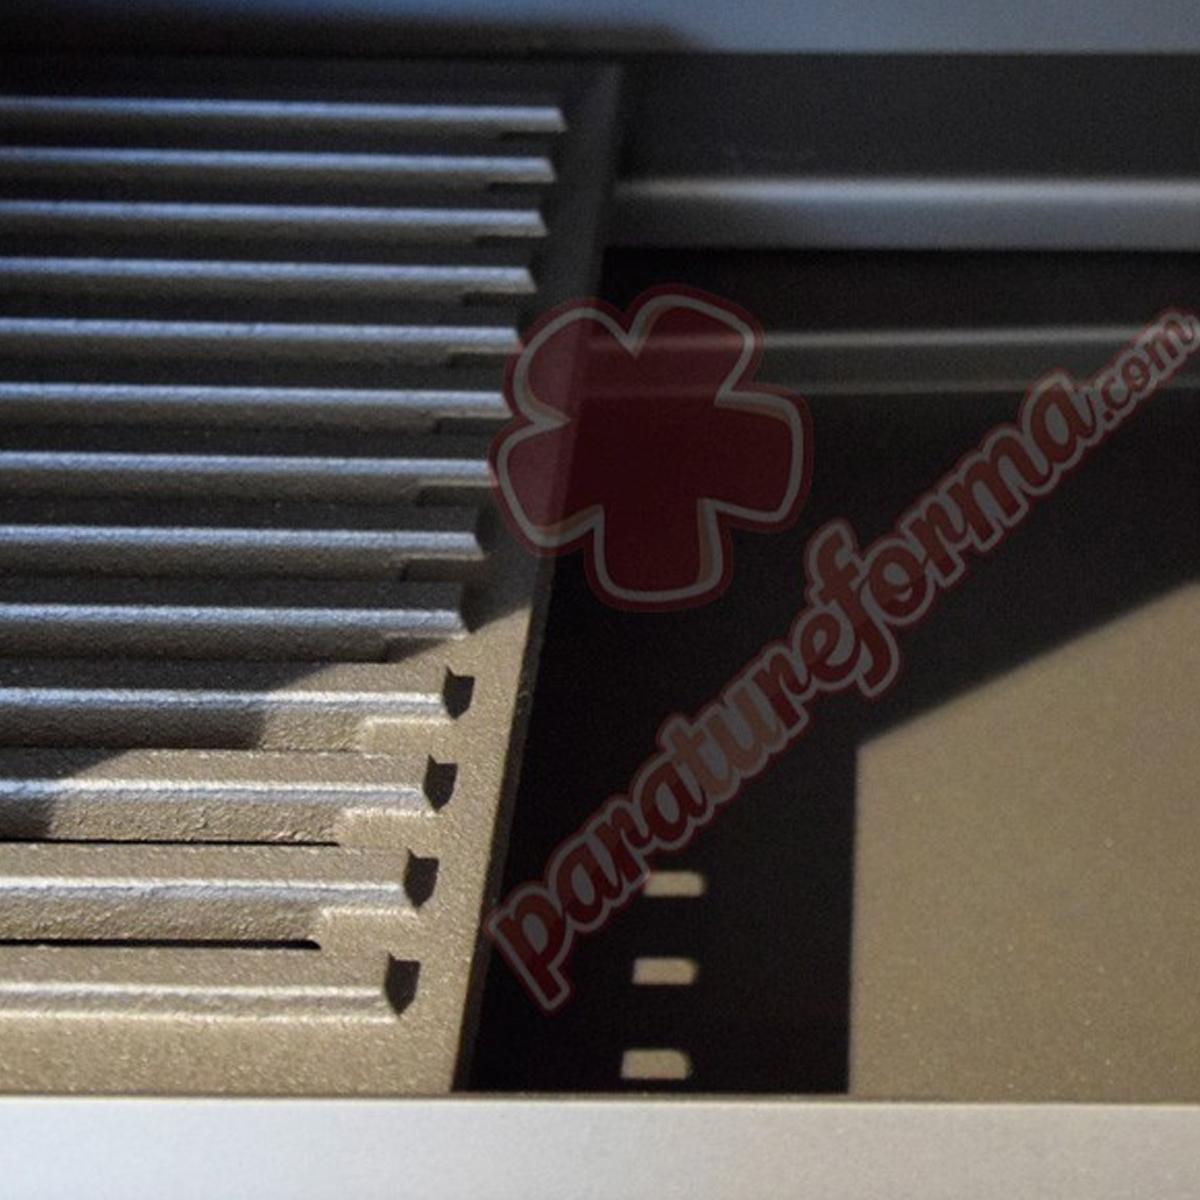 Estufa de leña con horno M-104 + Regalo directo Estufas de leña FM Calefacción